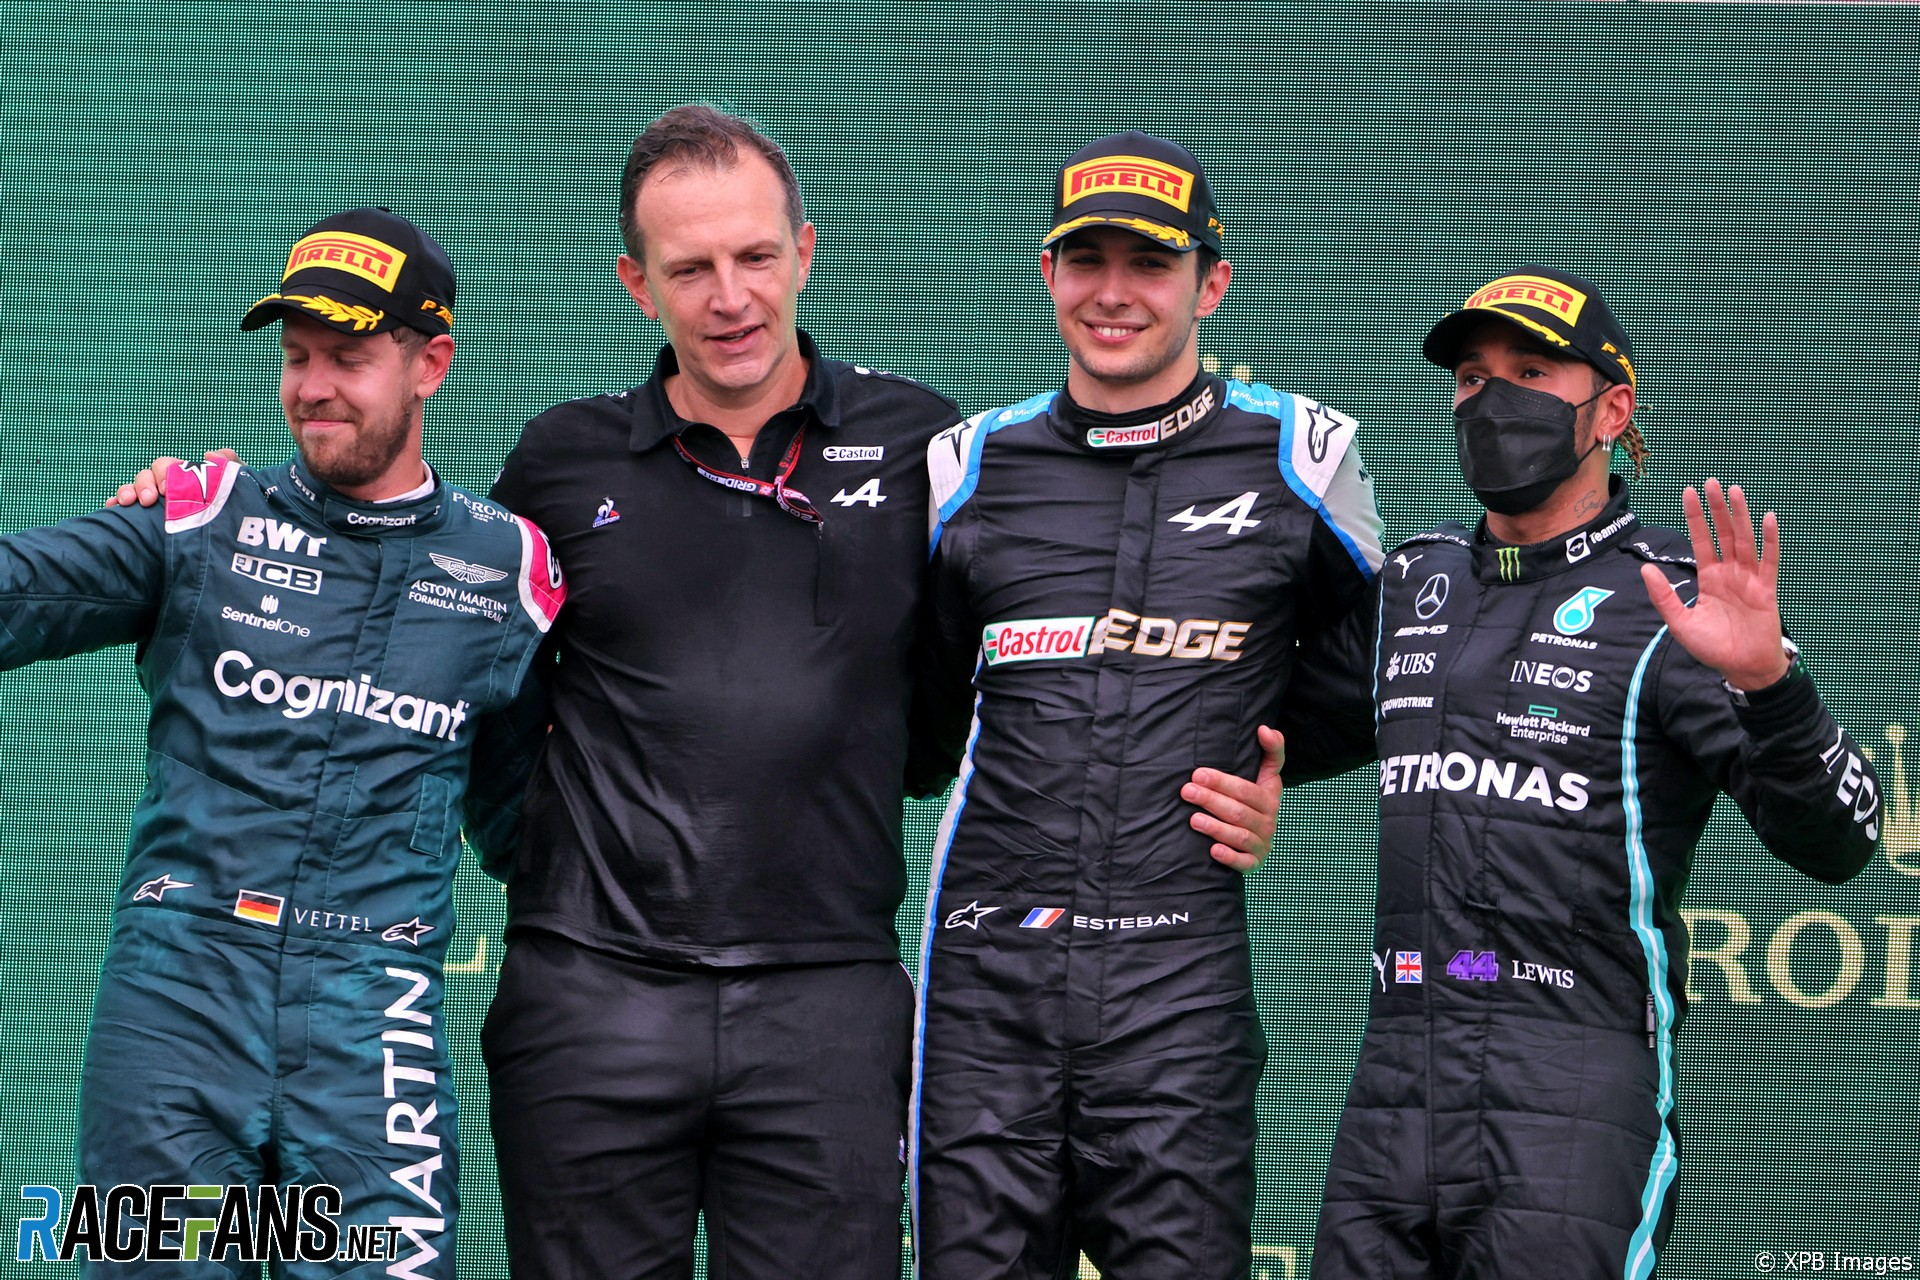 The Podium : Second Place Sebastian Vettel (Aston Martin Racing), Race Winner Esteban Ocon (Alpine F1 Team) and Third Place Lewis Hamilton (Mercedes AMG F1 Team)